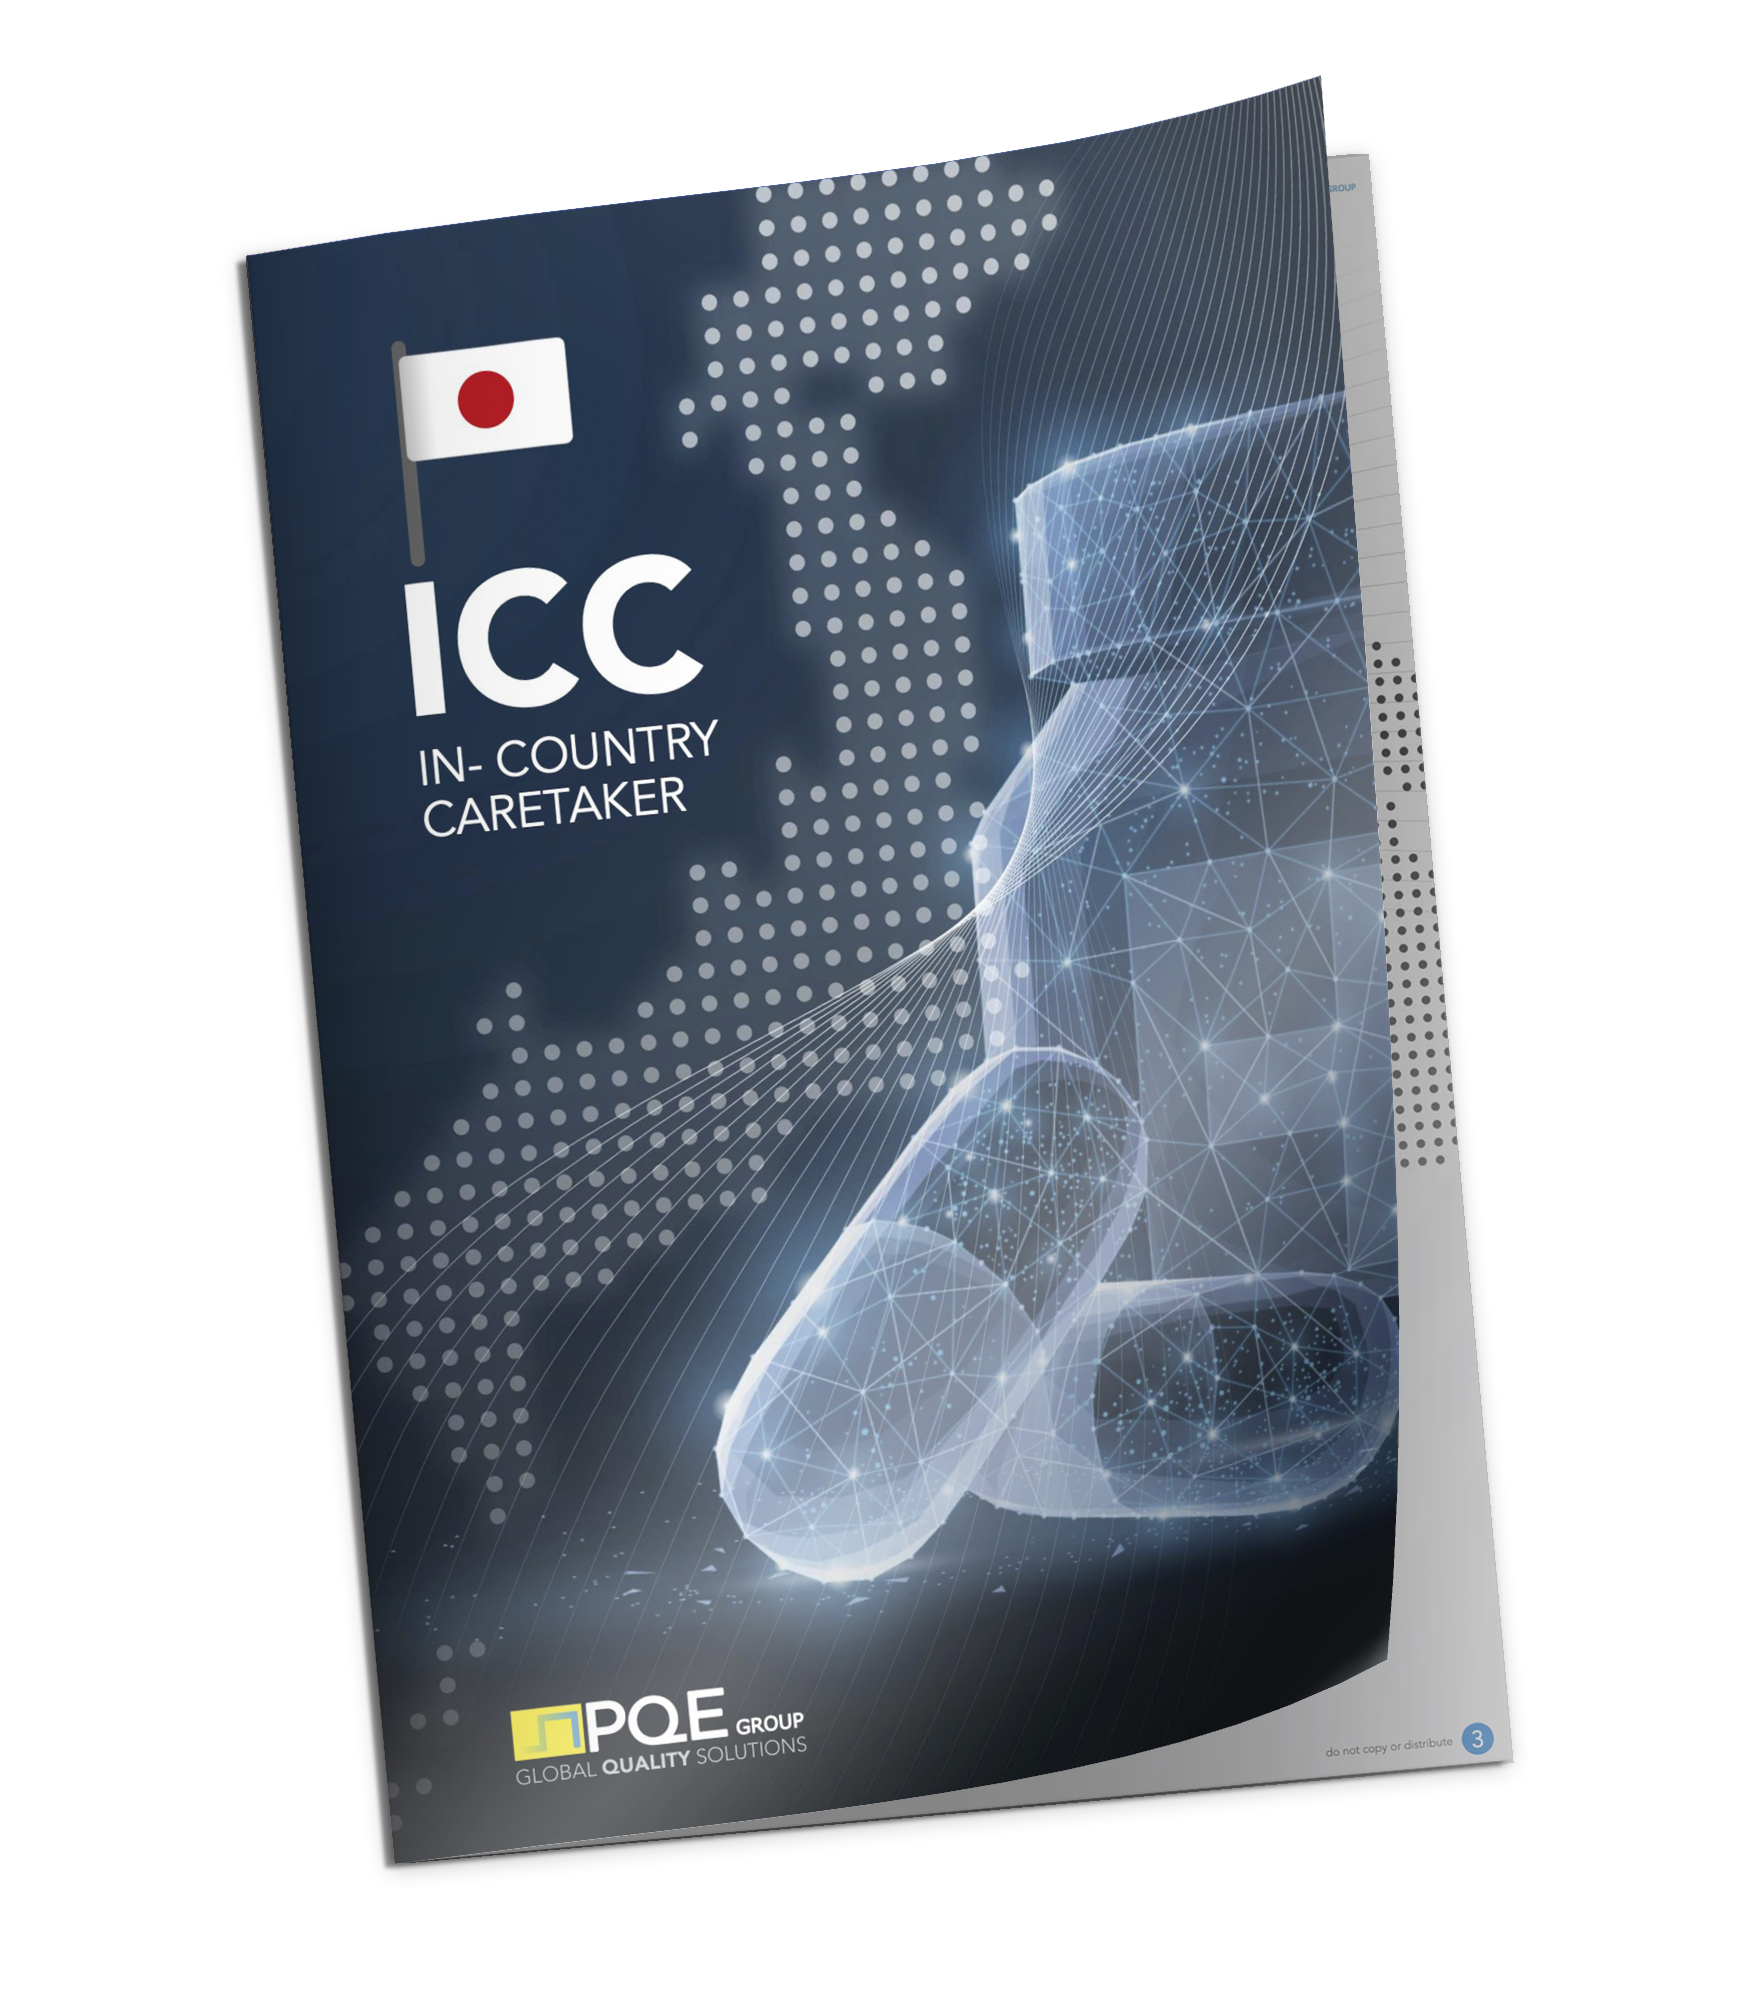 folder ICCvr2